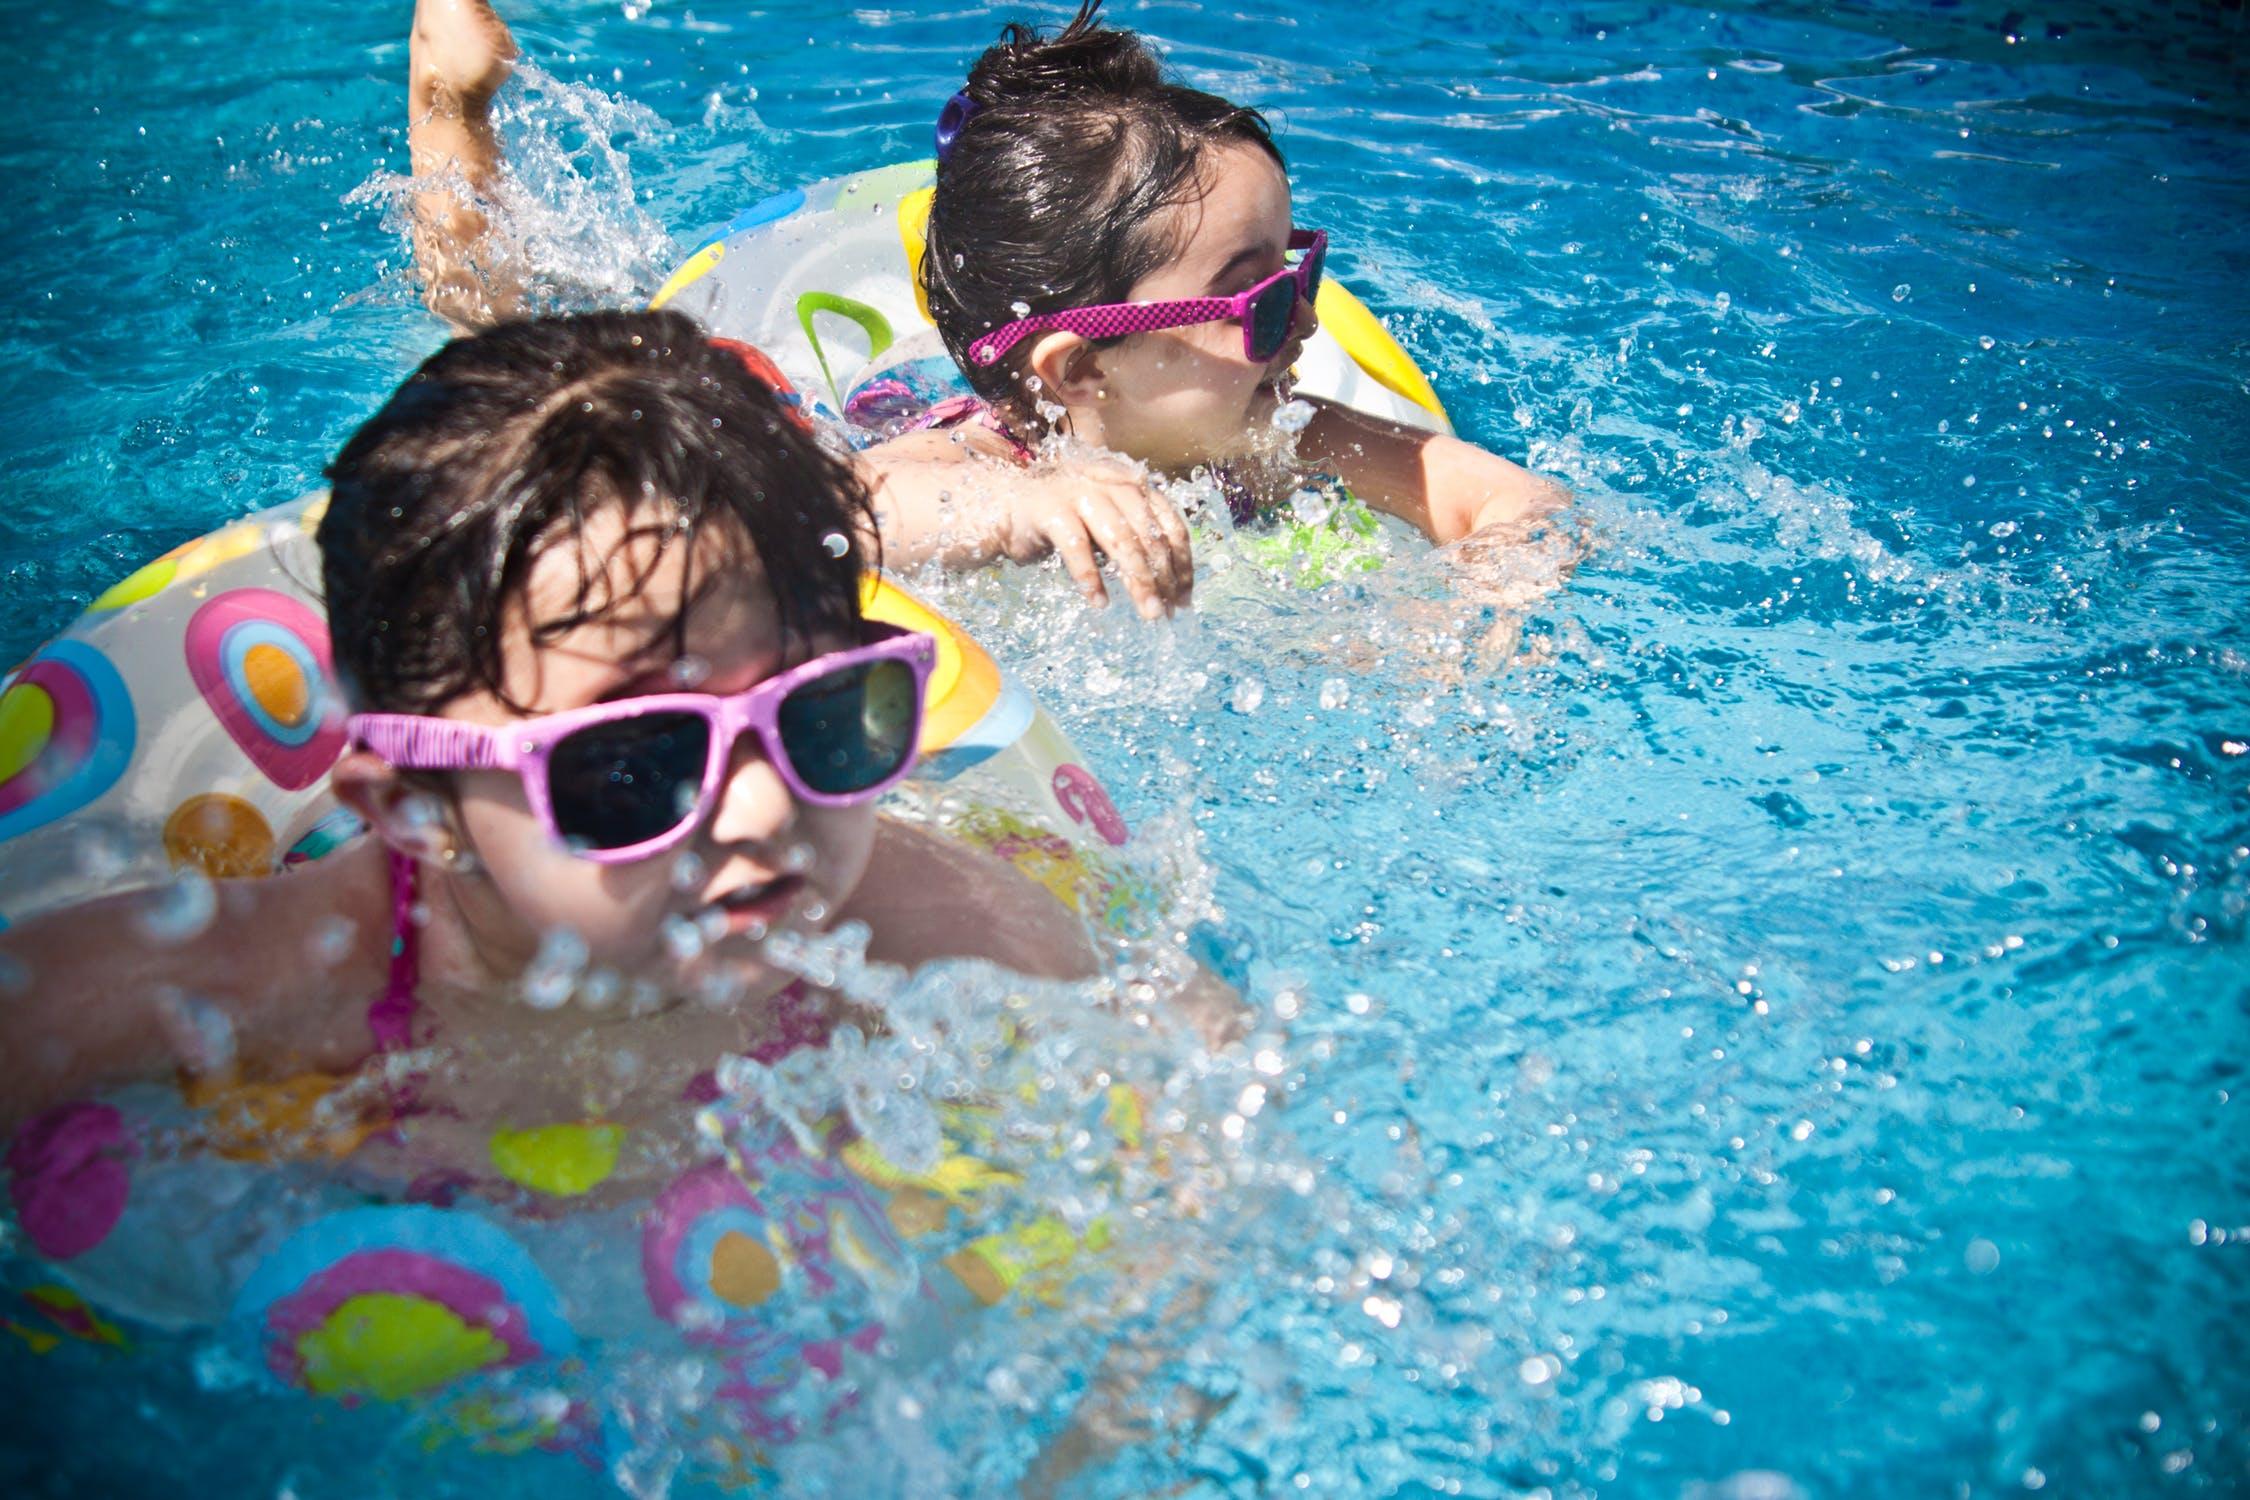 What Should Parents Know About Swim Lessons?